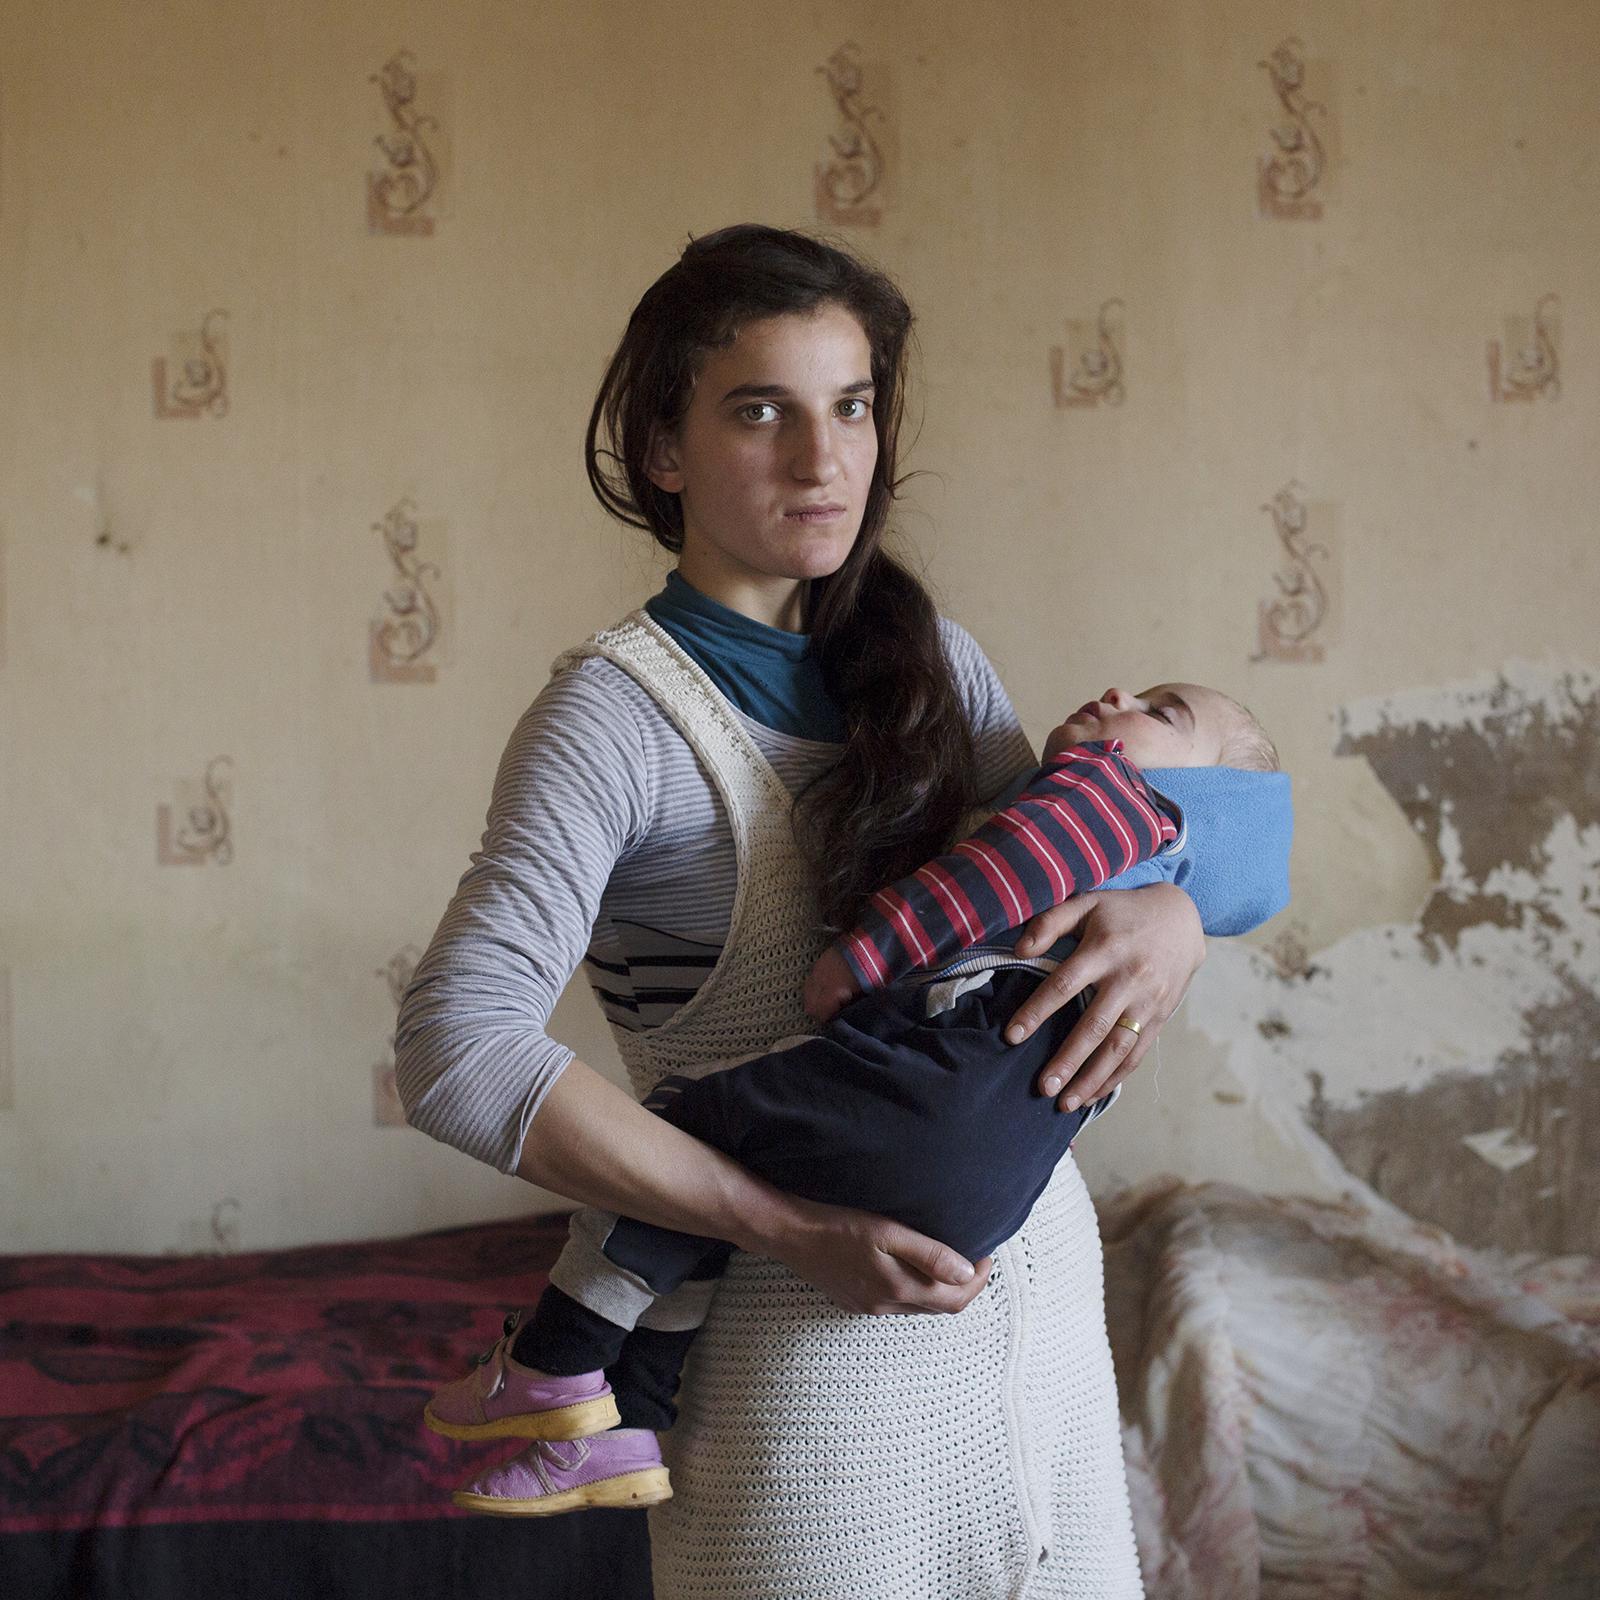 Myriam Meloni, Lost in Tradition